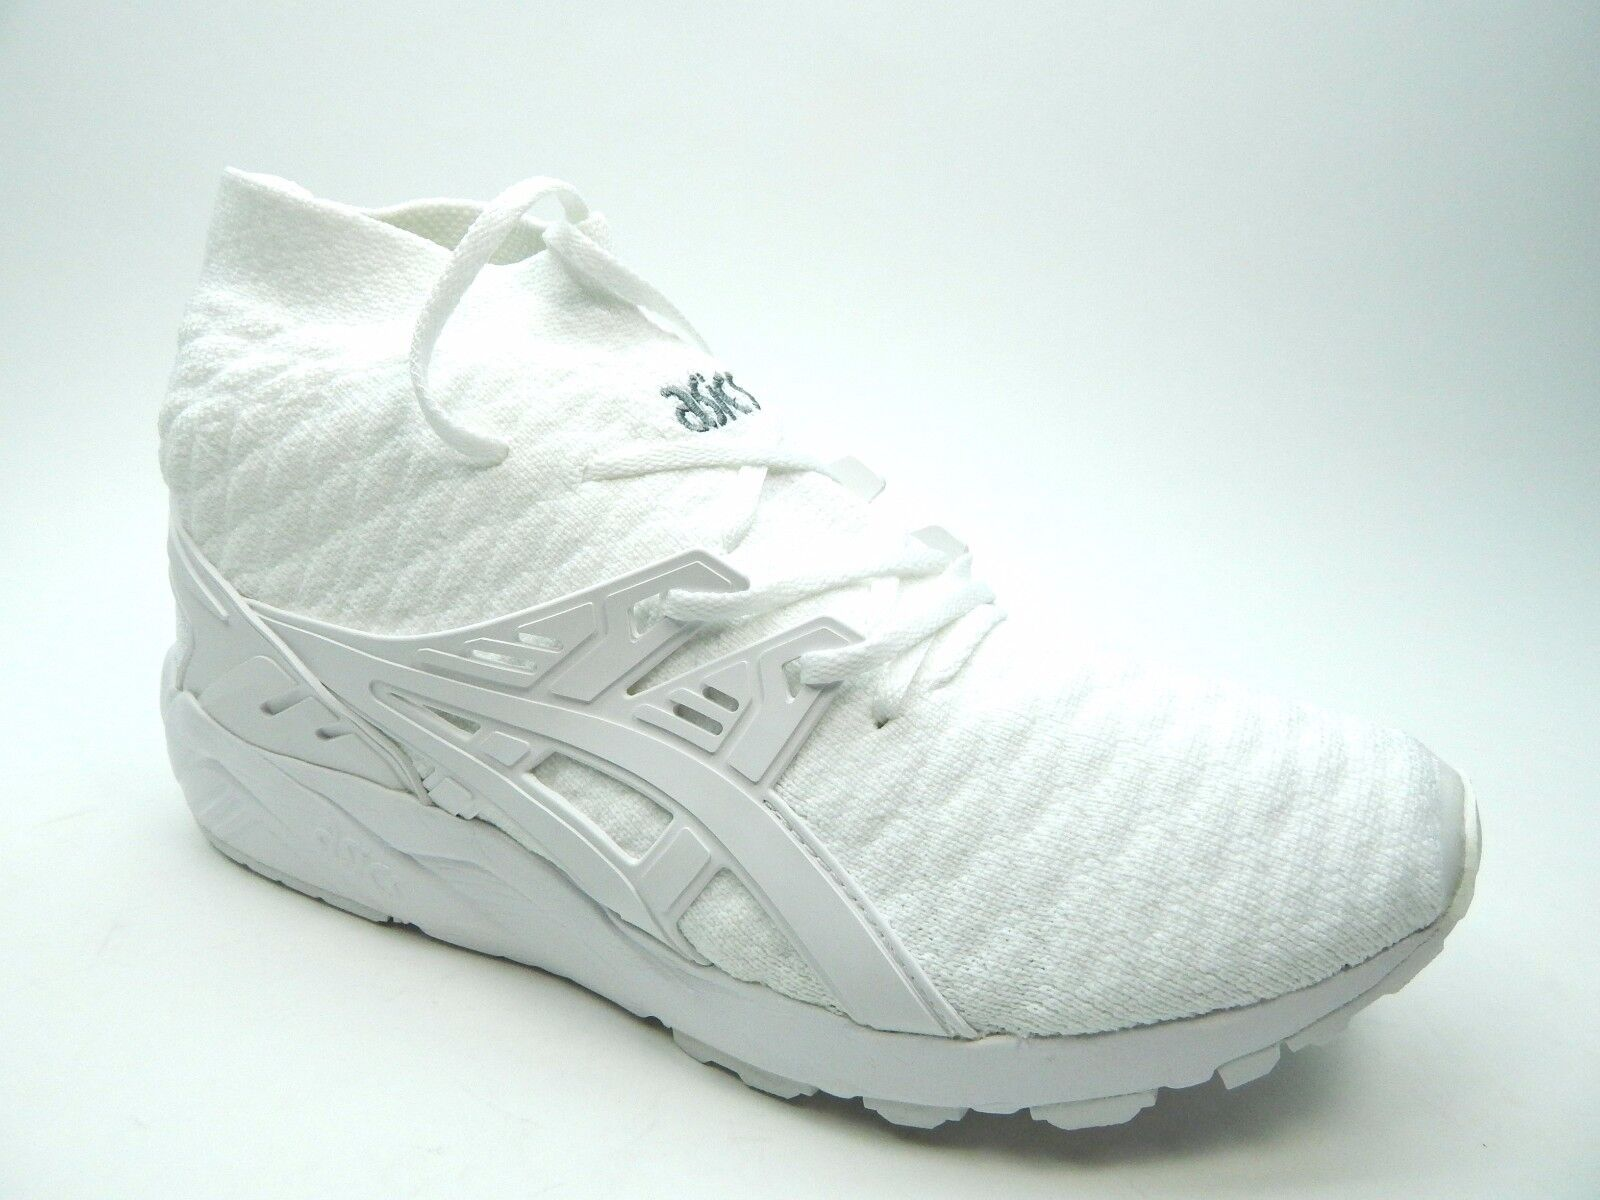 Asics Gel Kayano Entrenador De Punto Mt H7P4N 0101 blancoo blancoo Zapatos para hombres